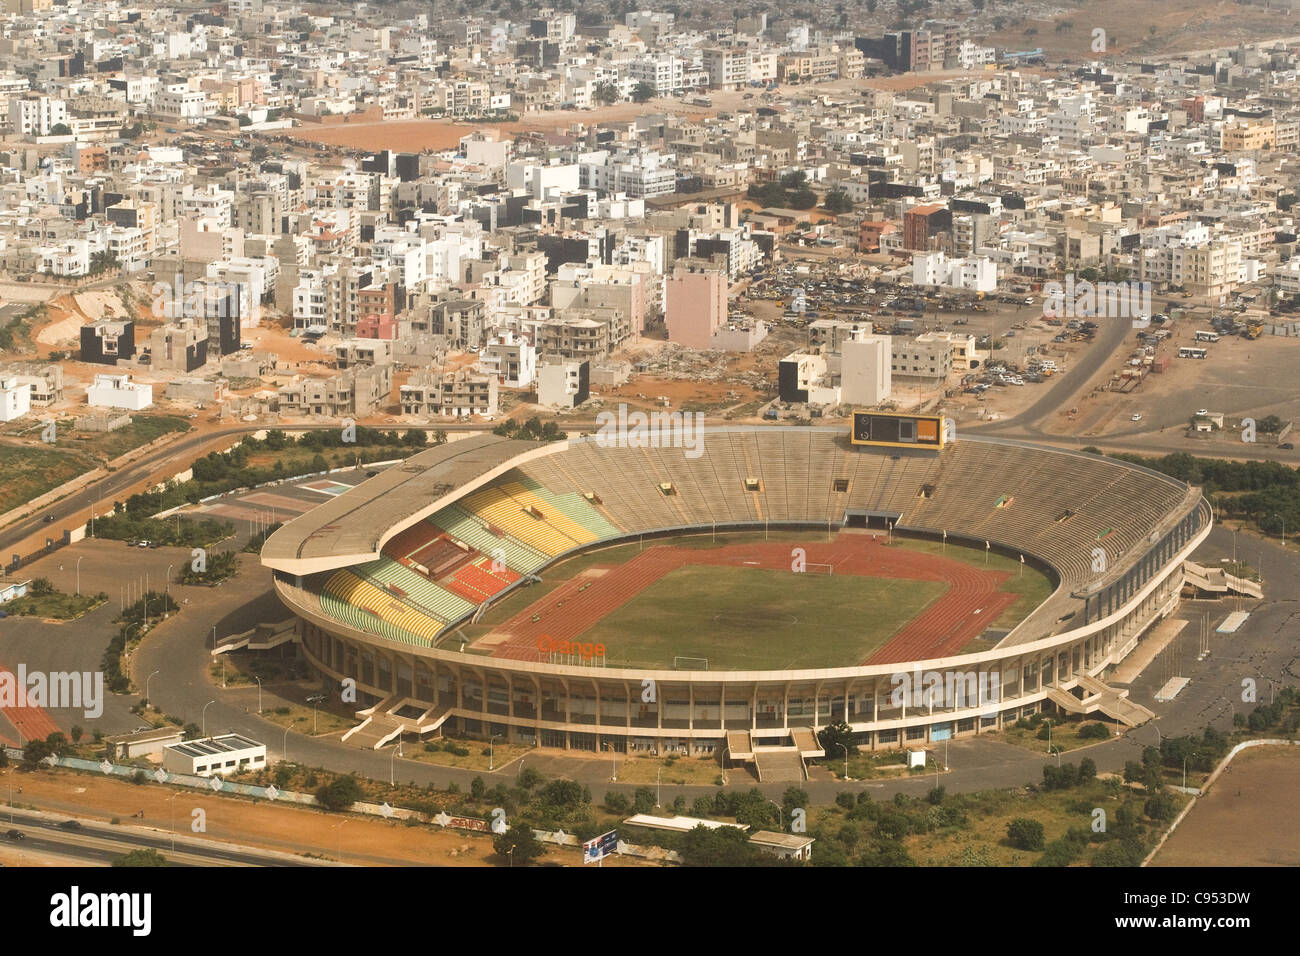 Aerial view of the stade Leopold Sedar Senghor stadium in Dakar, Senegal. Stock Photo